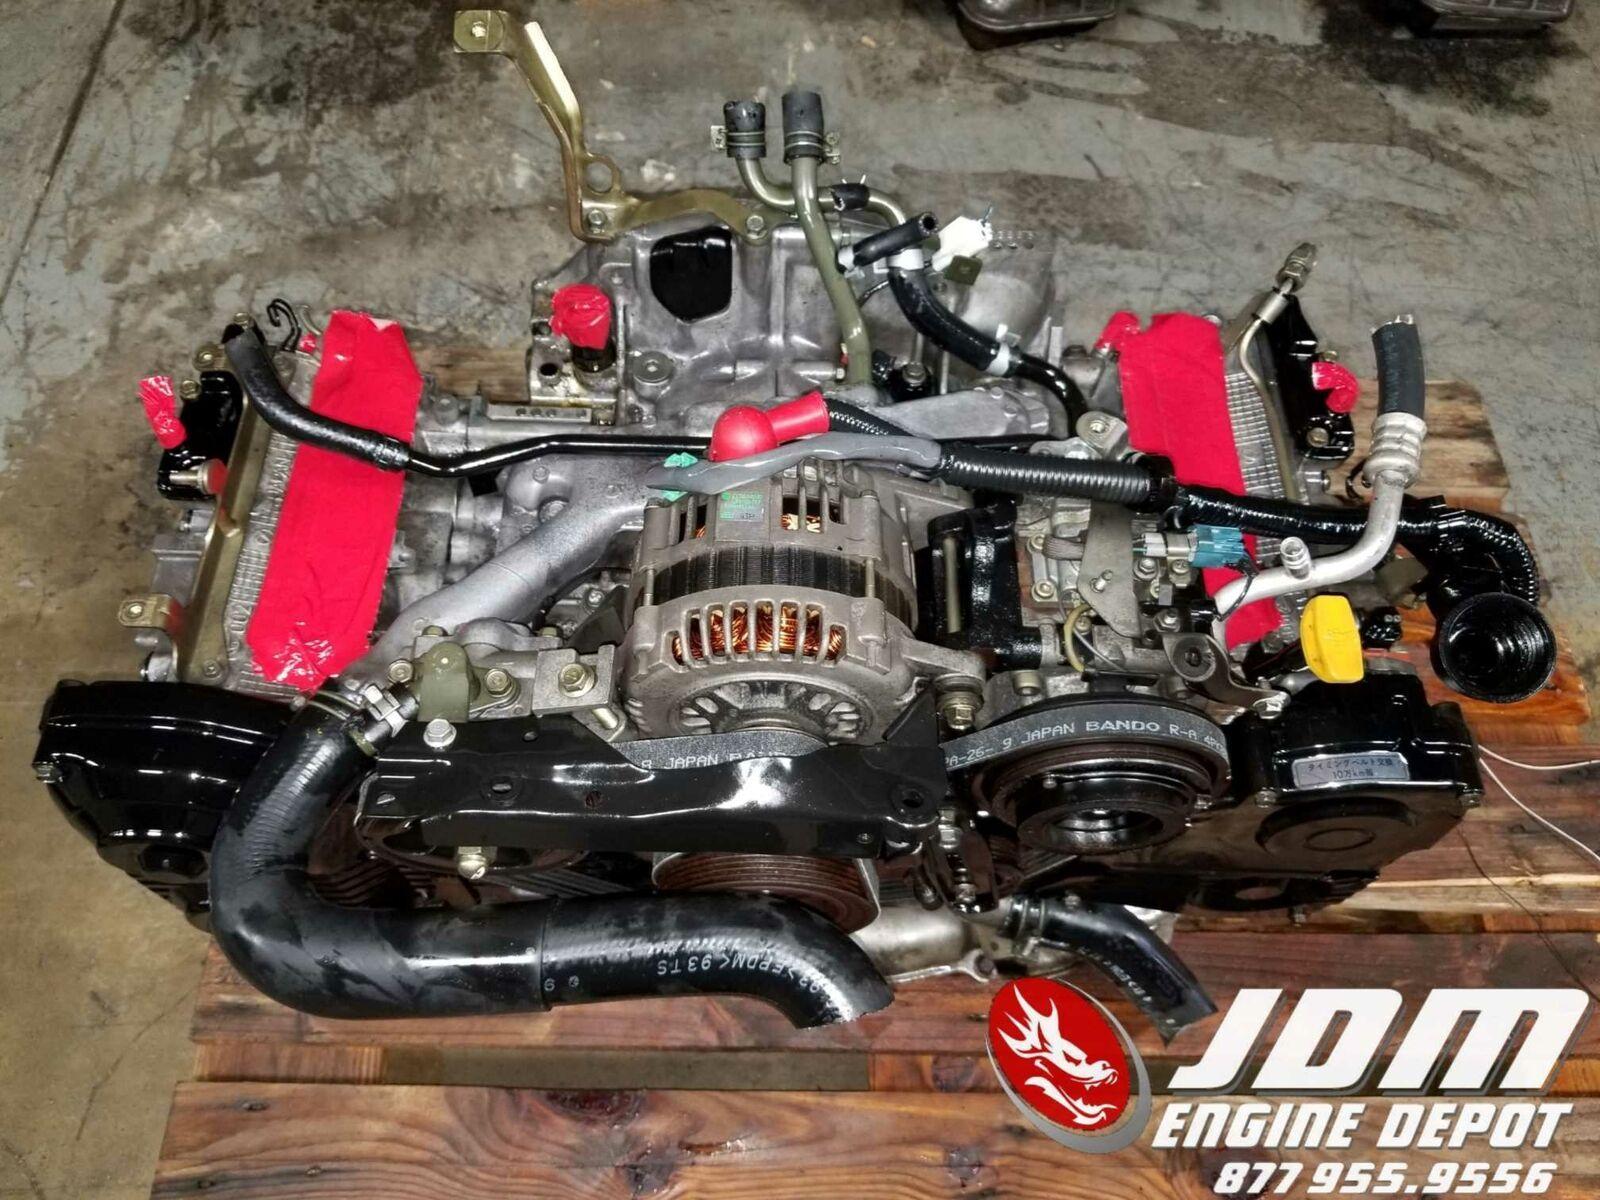 Wrx Engine Wrx Wrx Engine Jdm Engines